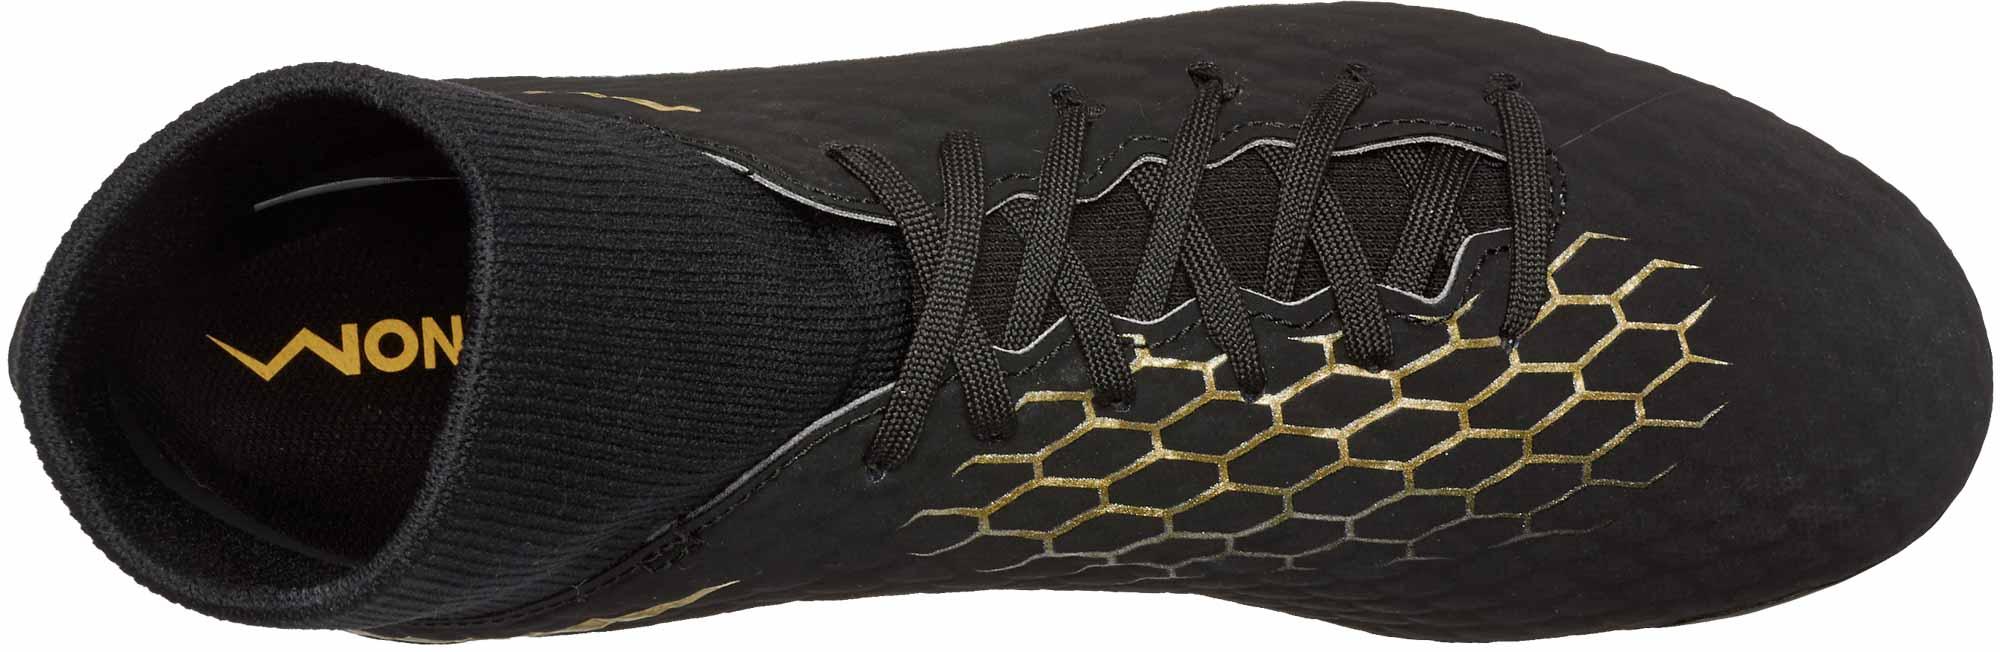 8c6ddf8337f5d Nike Hypervenom Phantom III Academy DF FG - Black/Metallic Vivid ...